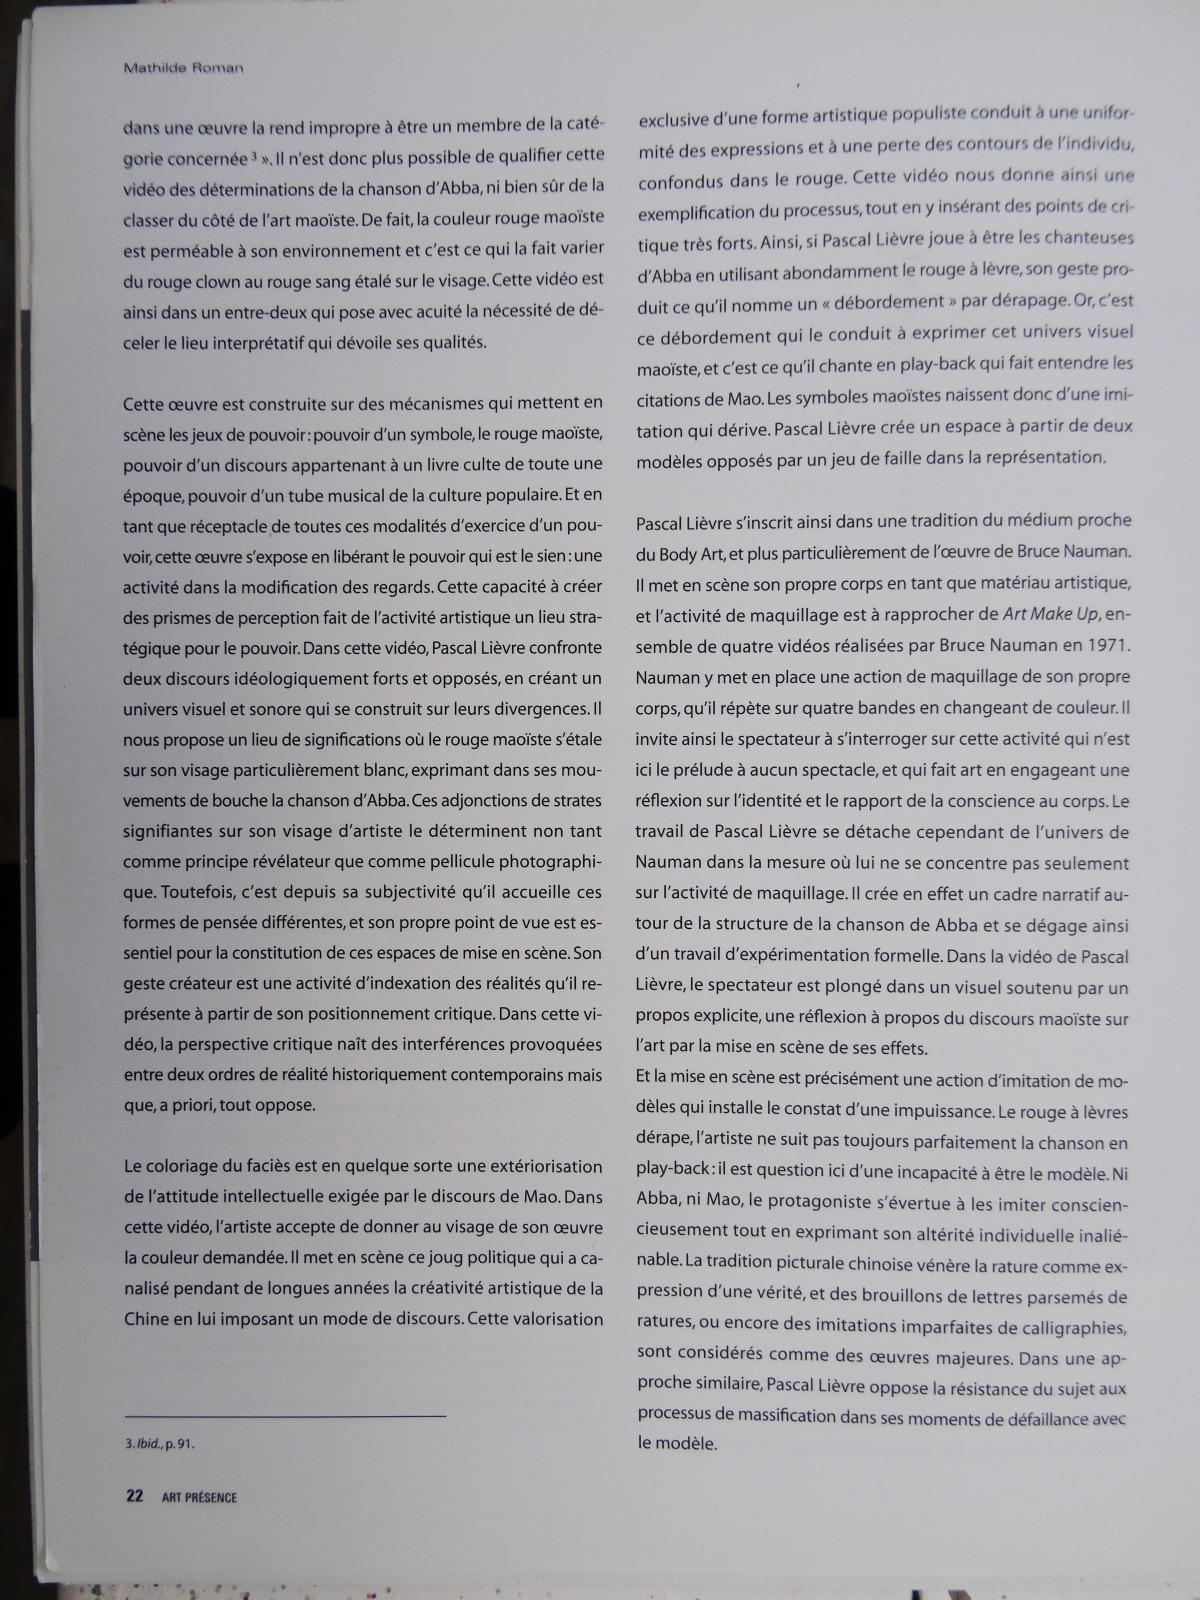 texte mathilde roman art presence 02